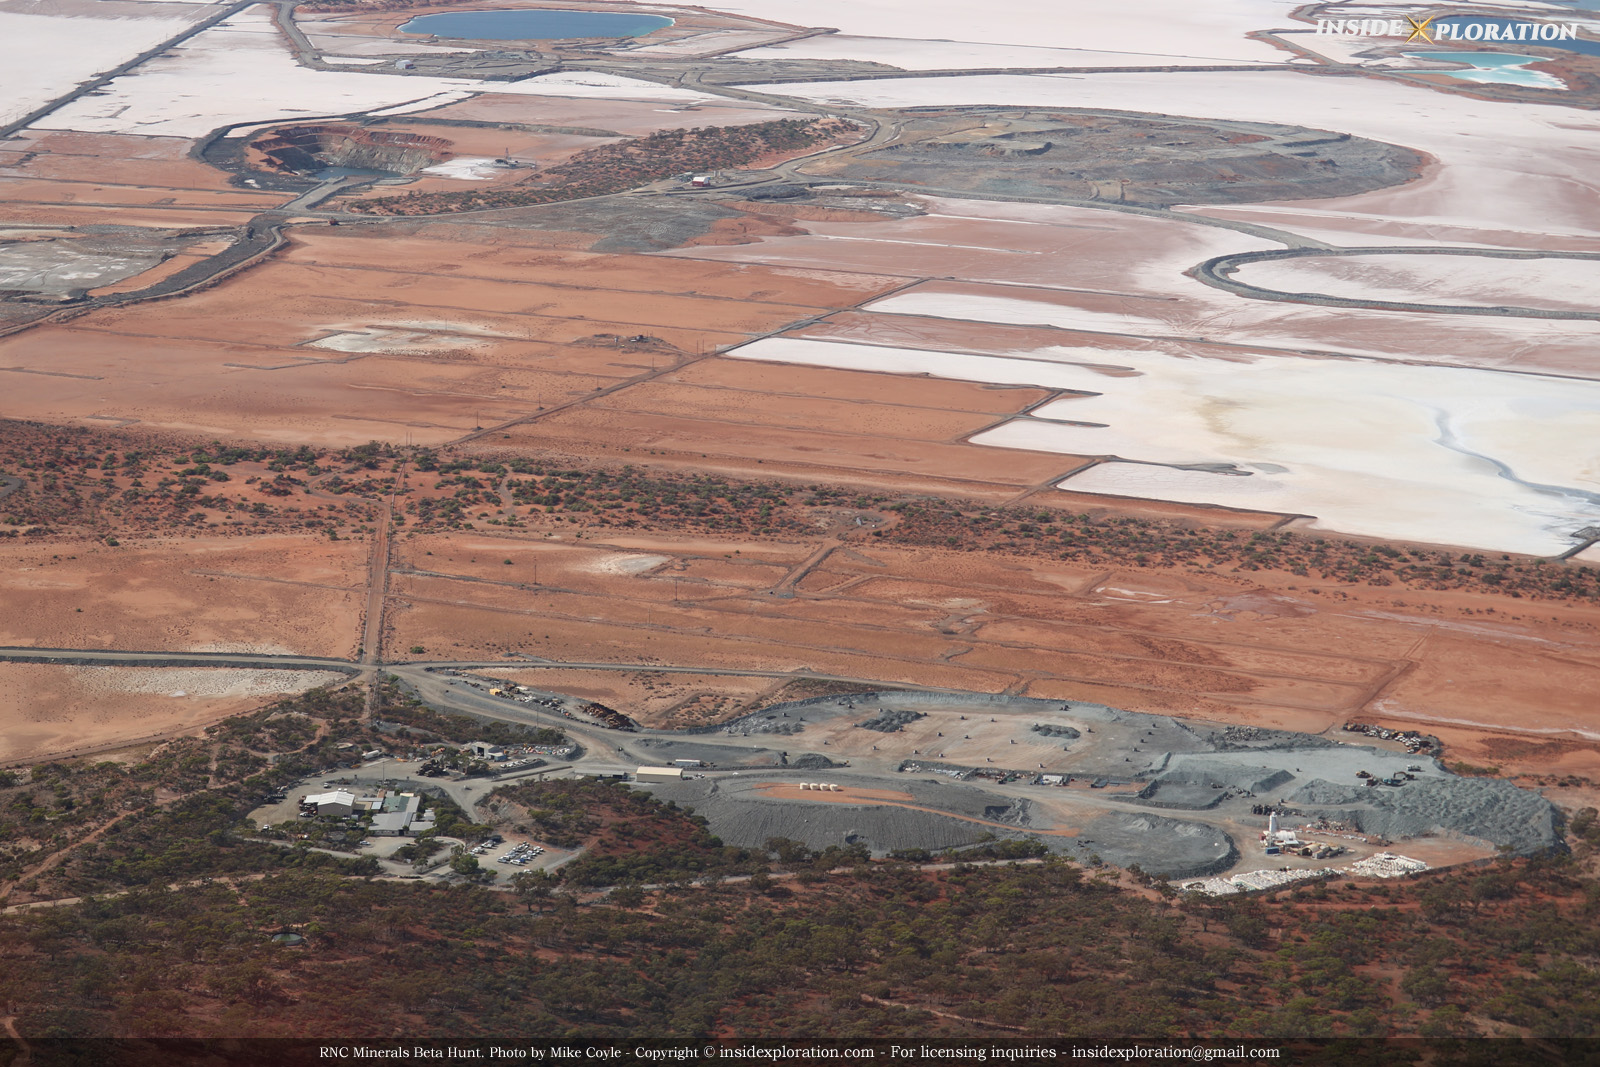 Beta Hunt – RNC Minerals Exclusive Photos Insidexploration